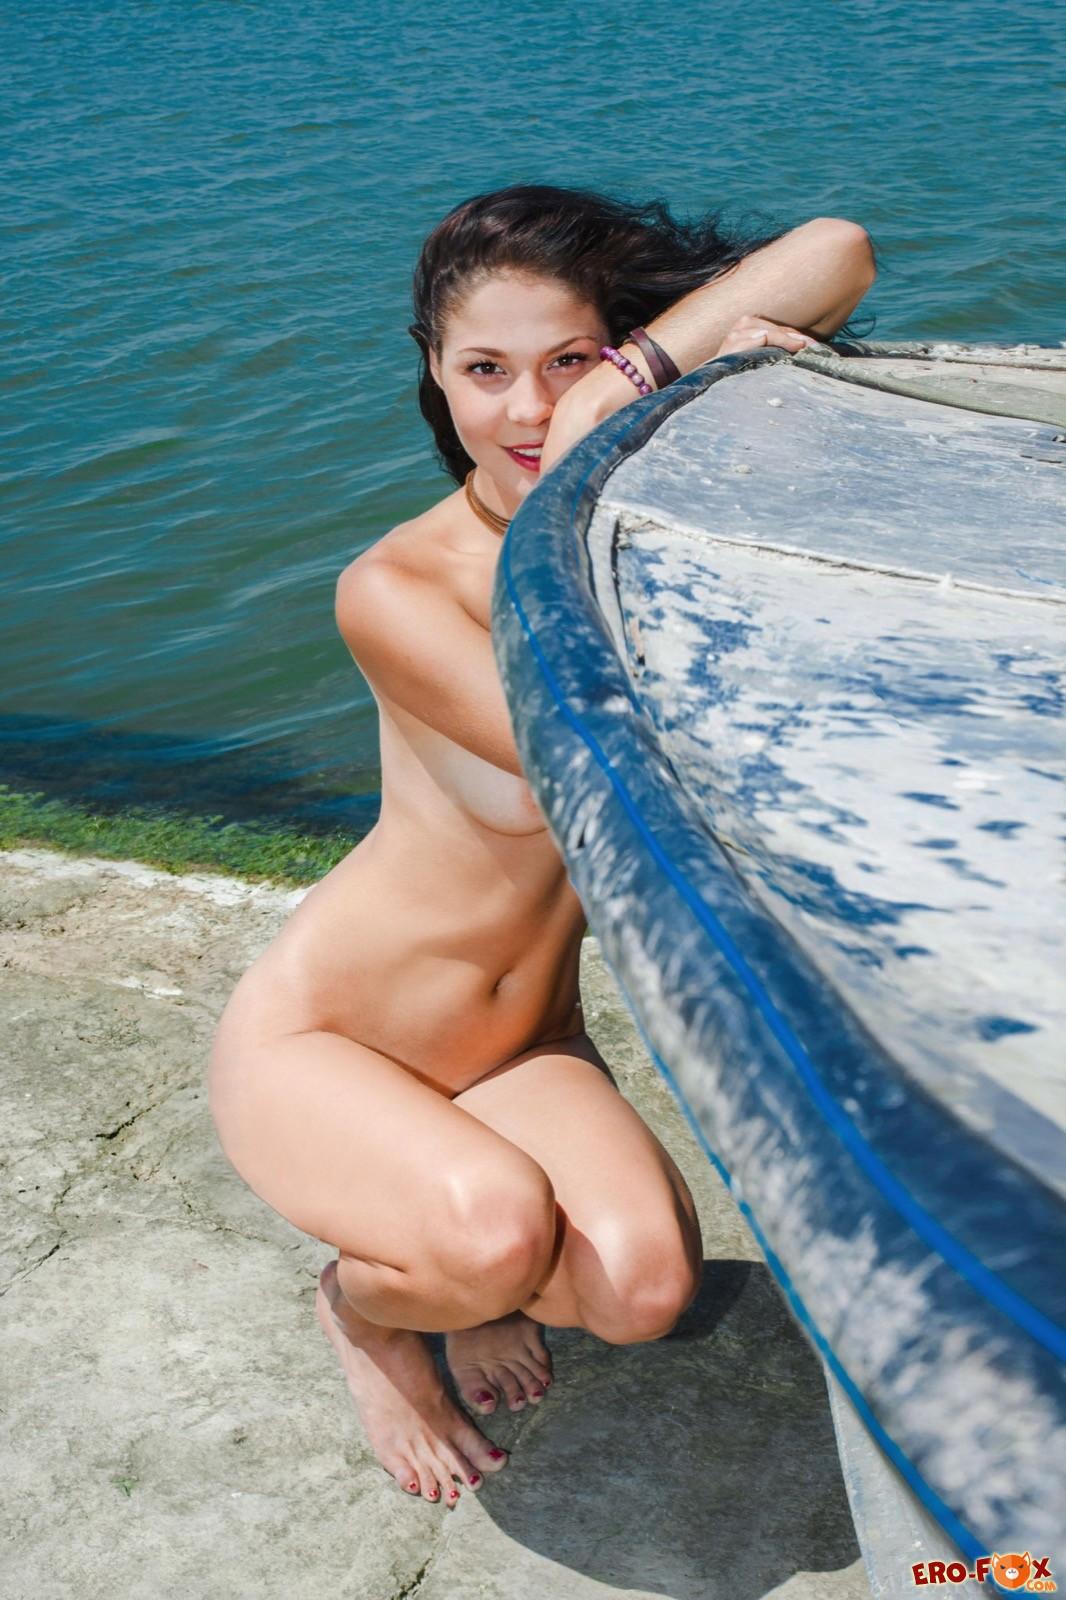 Сексуальная голая брюнетка на фоне моря